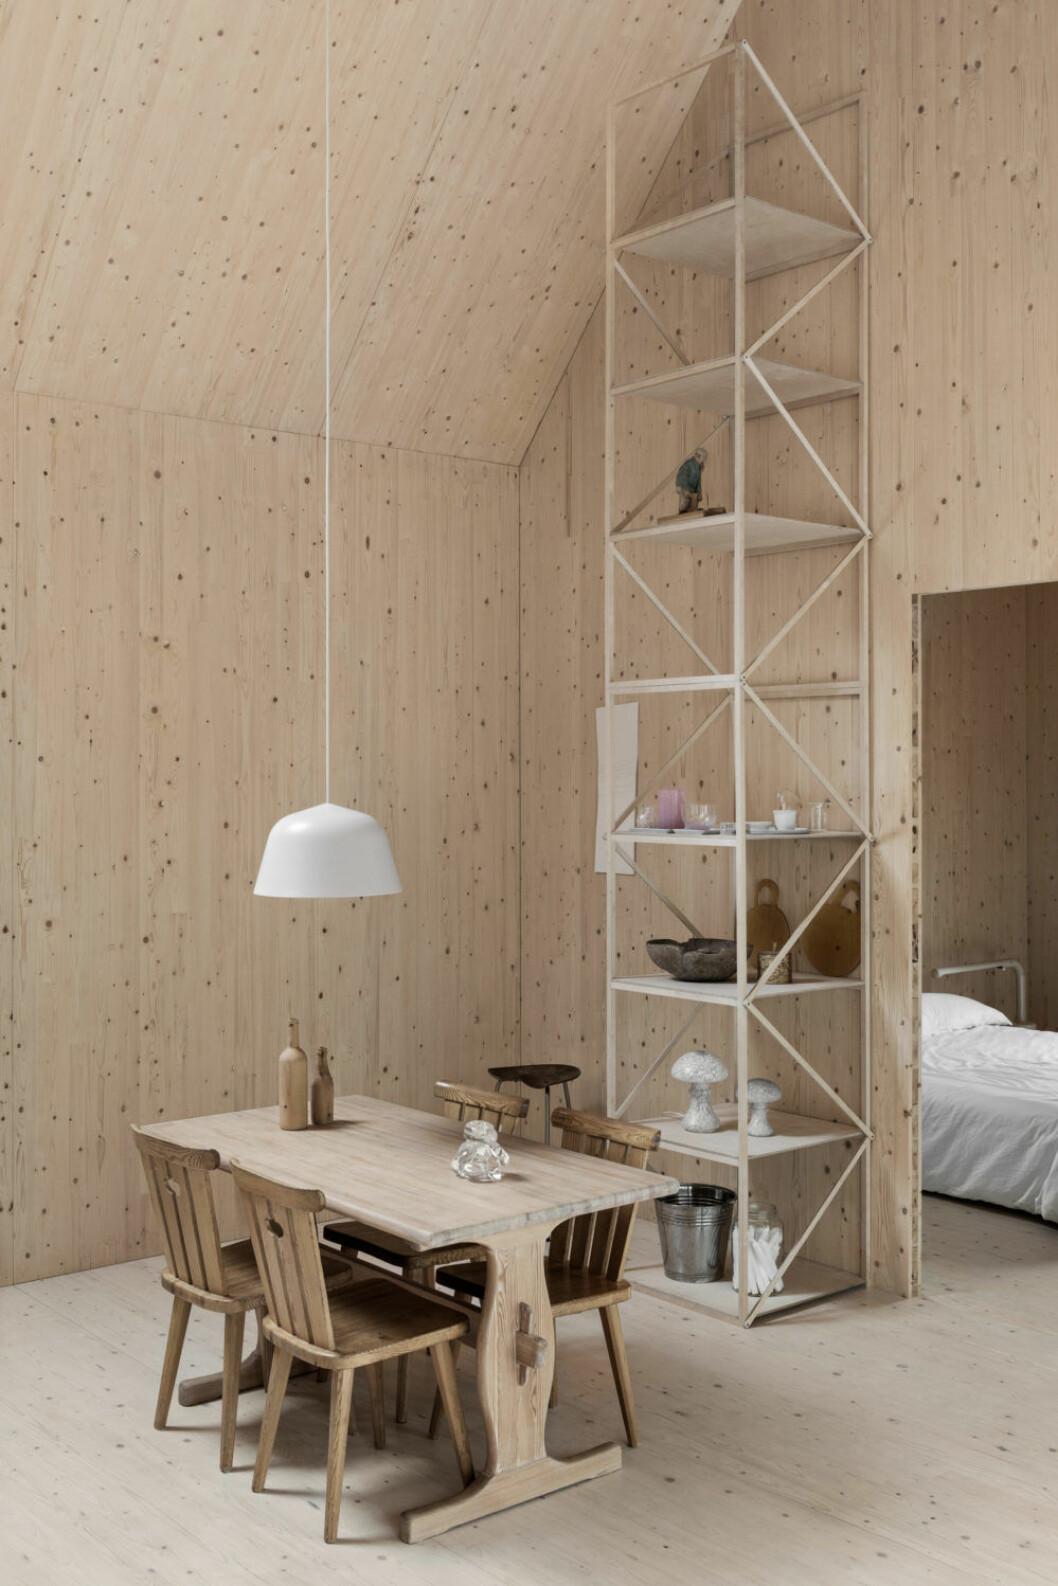 Hylla från en utställningsarkitektur. Lampa Ambit, TAF studio för Muuto.Foto Erik Lefvander, styling Annaleena Leino Karlsson